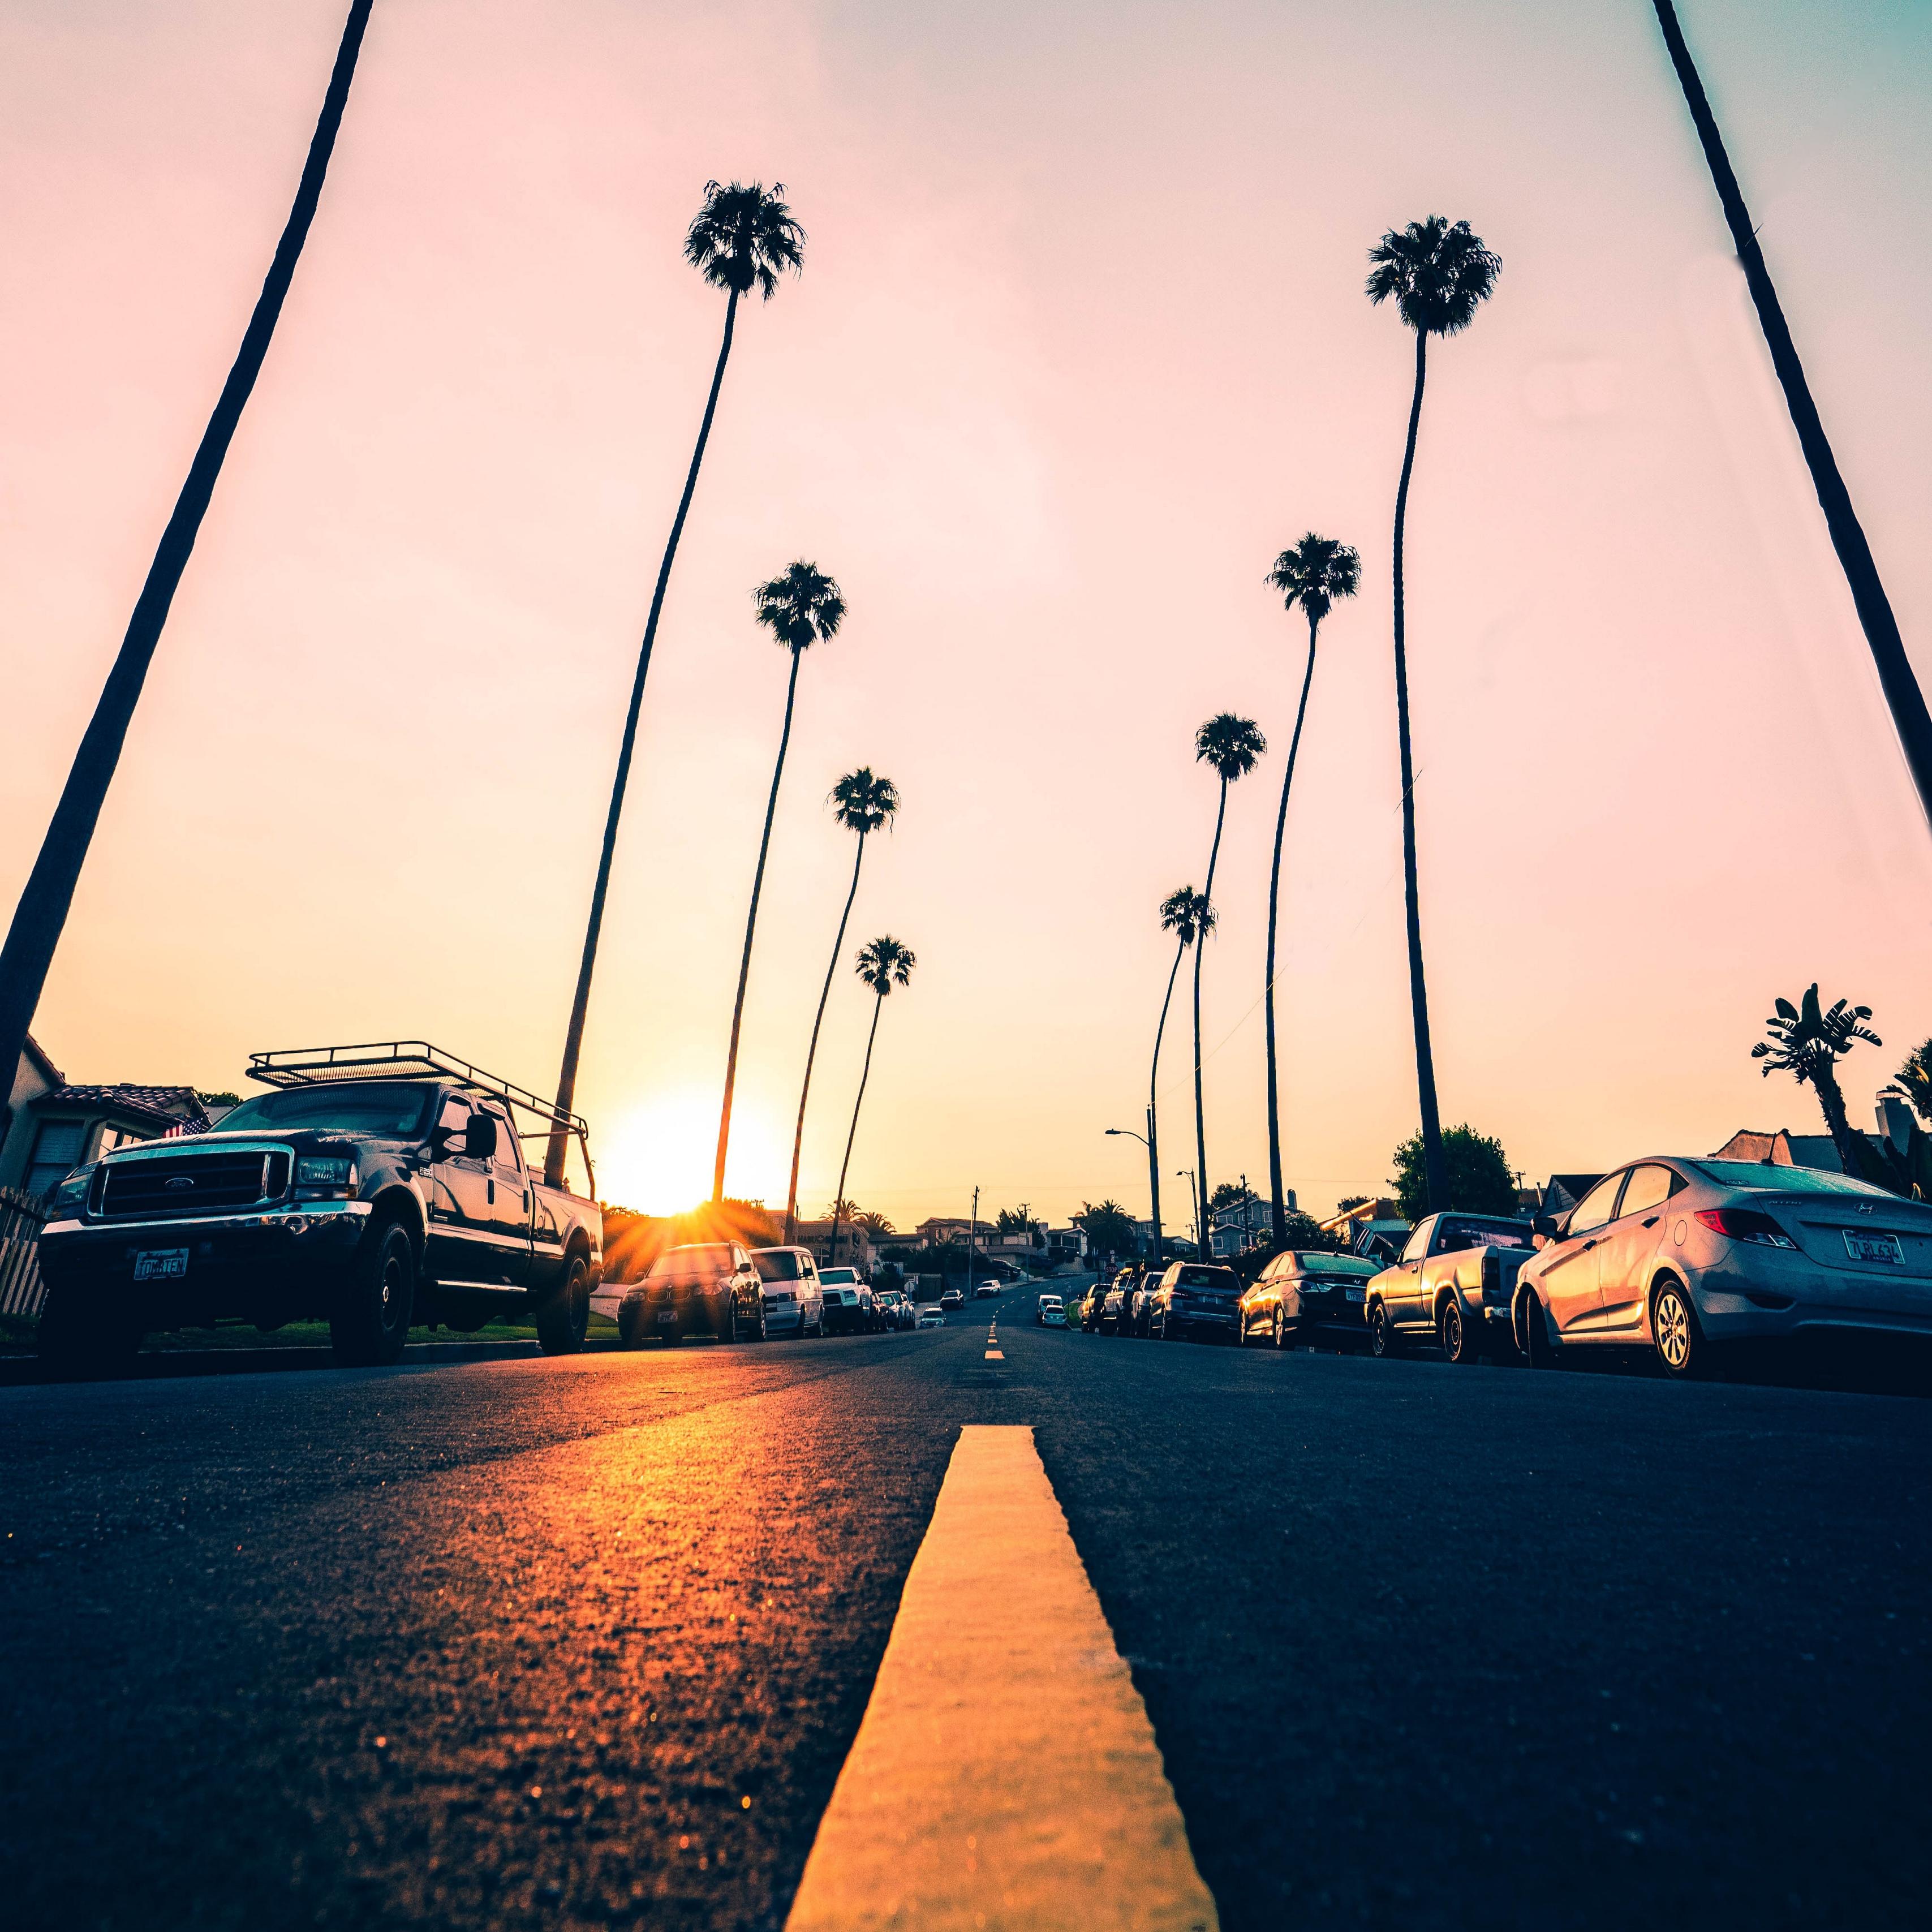 Wallpaper Road, Palm Trees, Asphalt, Cars, Marking, - California Palm Trees Iphone - HD Wallpaper